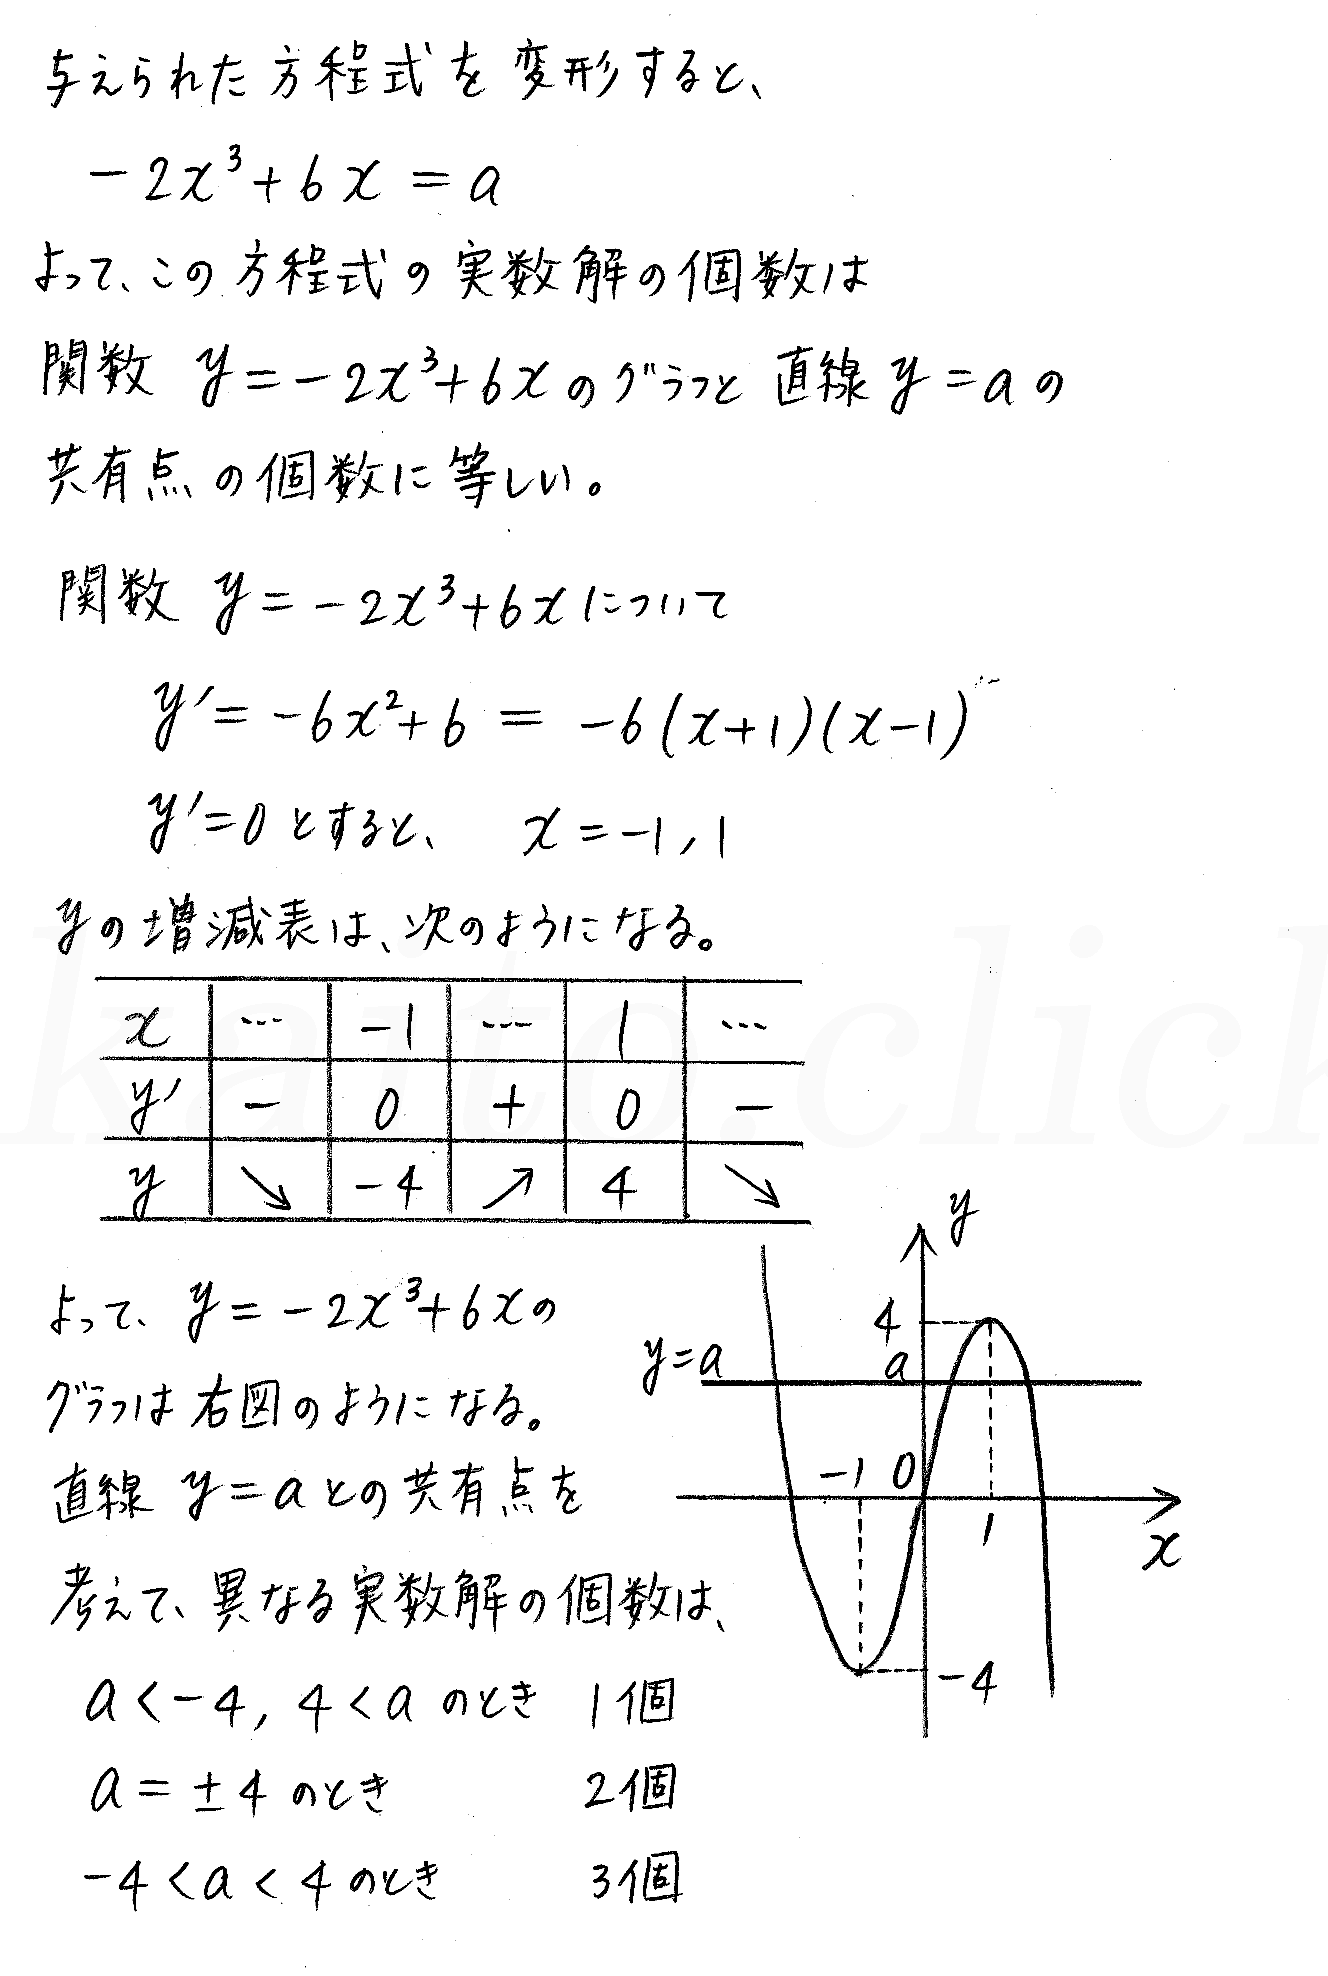 3TRIAL数学2-396解答